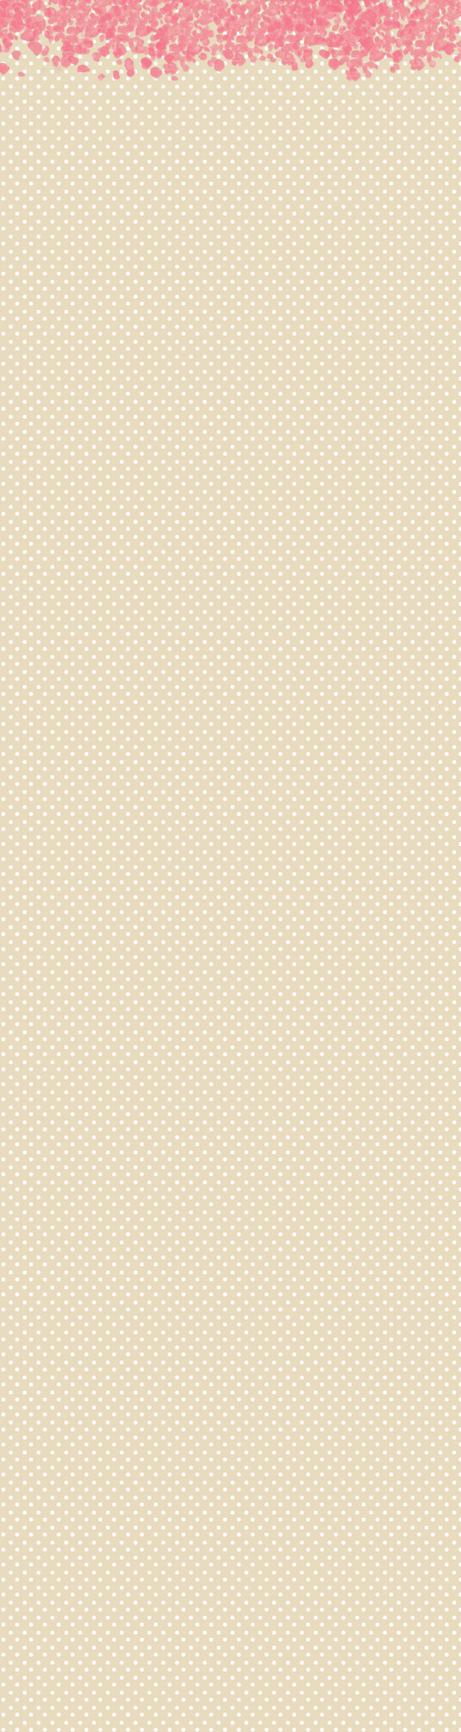 Custom Background 12 by mylastel